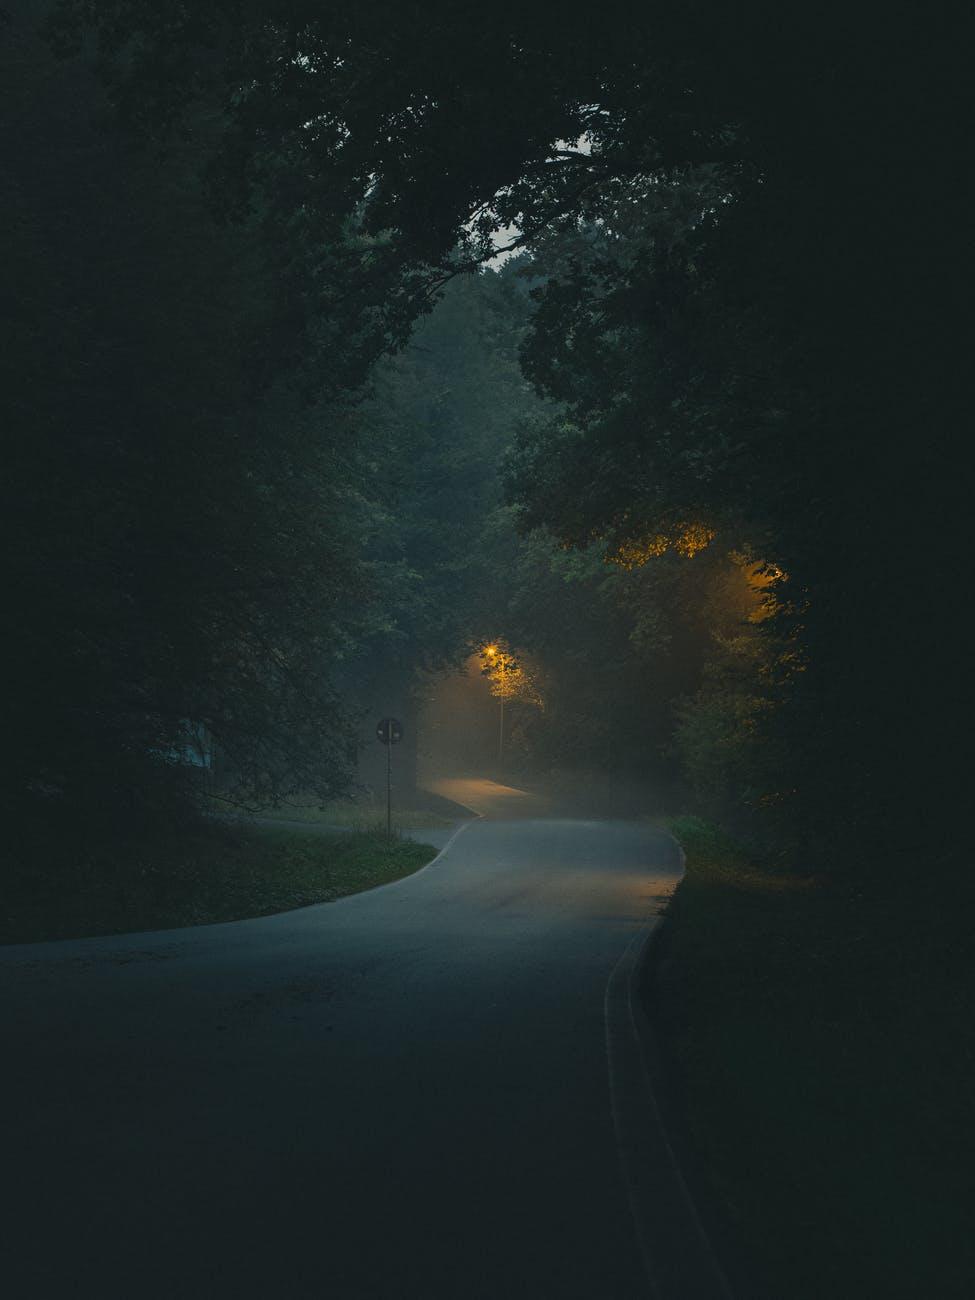 gray asphalt road between trees